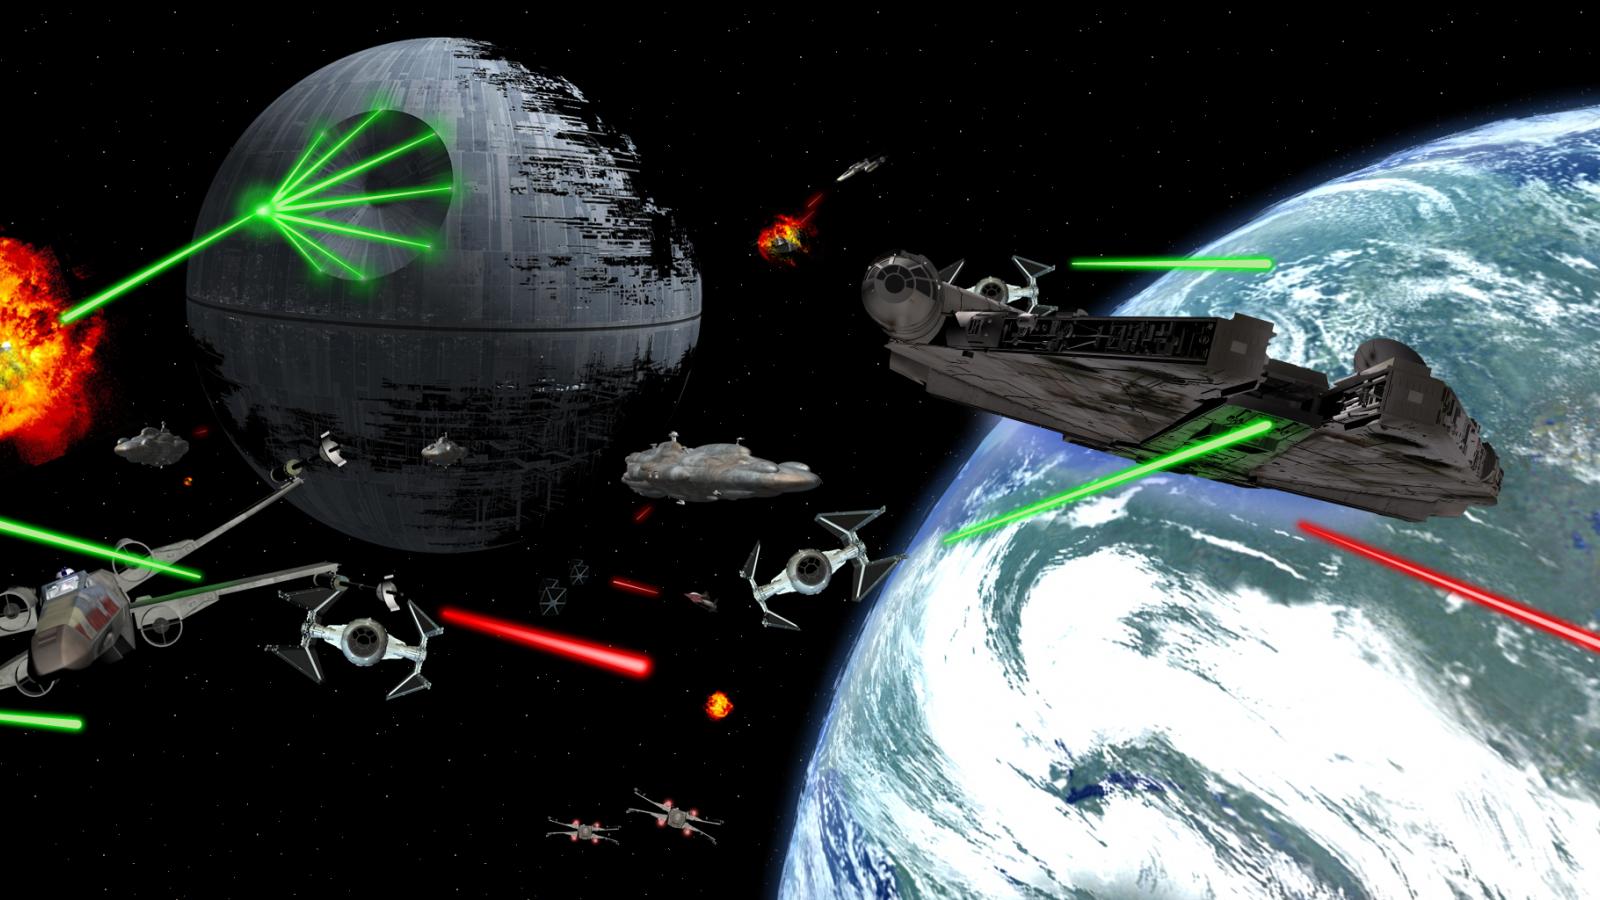 Free Download 50 Star Wars Space Battle Wallpaper On